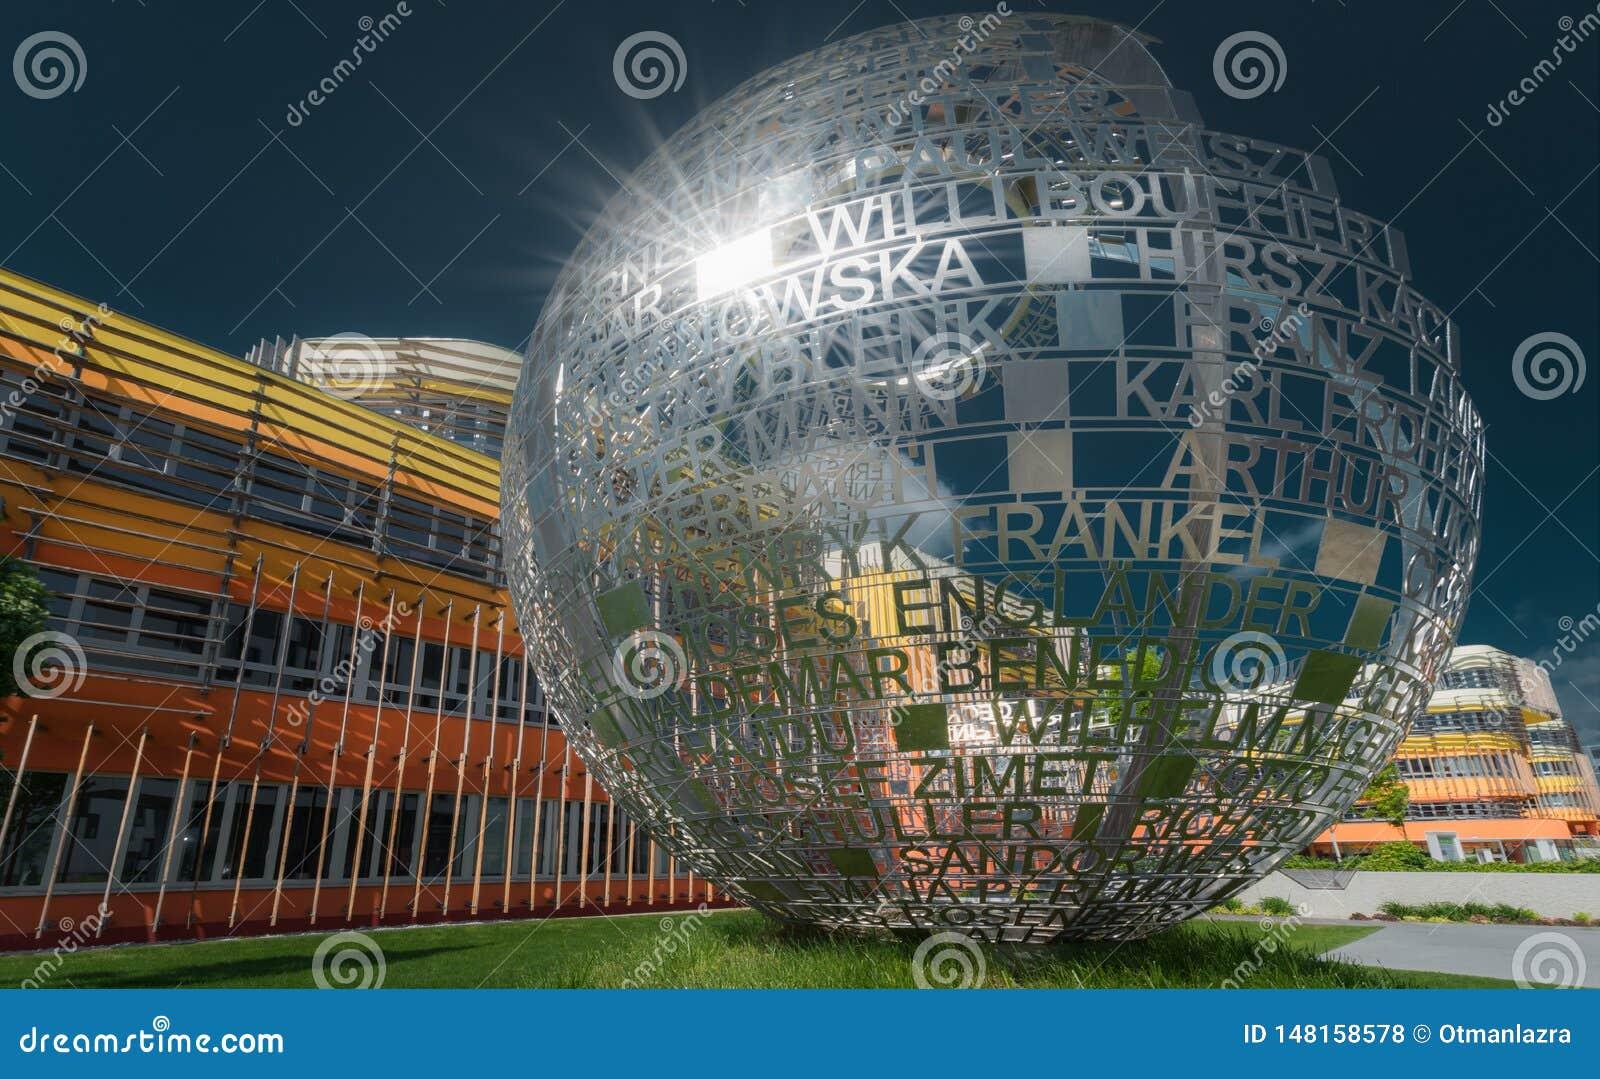 Sculpture University of Economics in Vienna